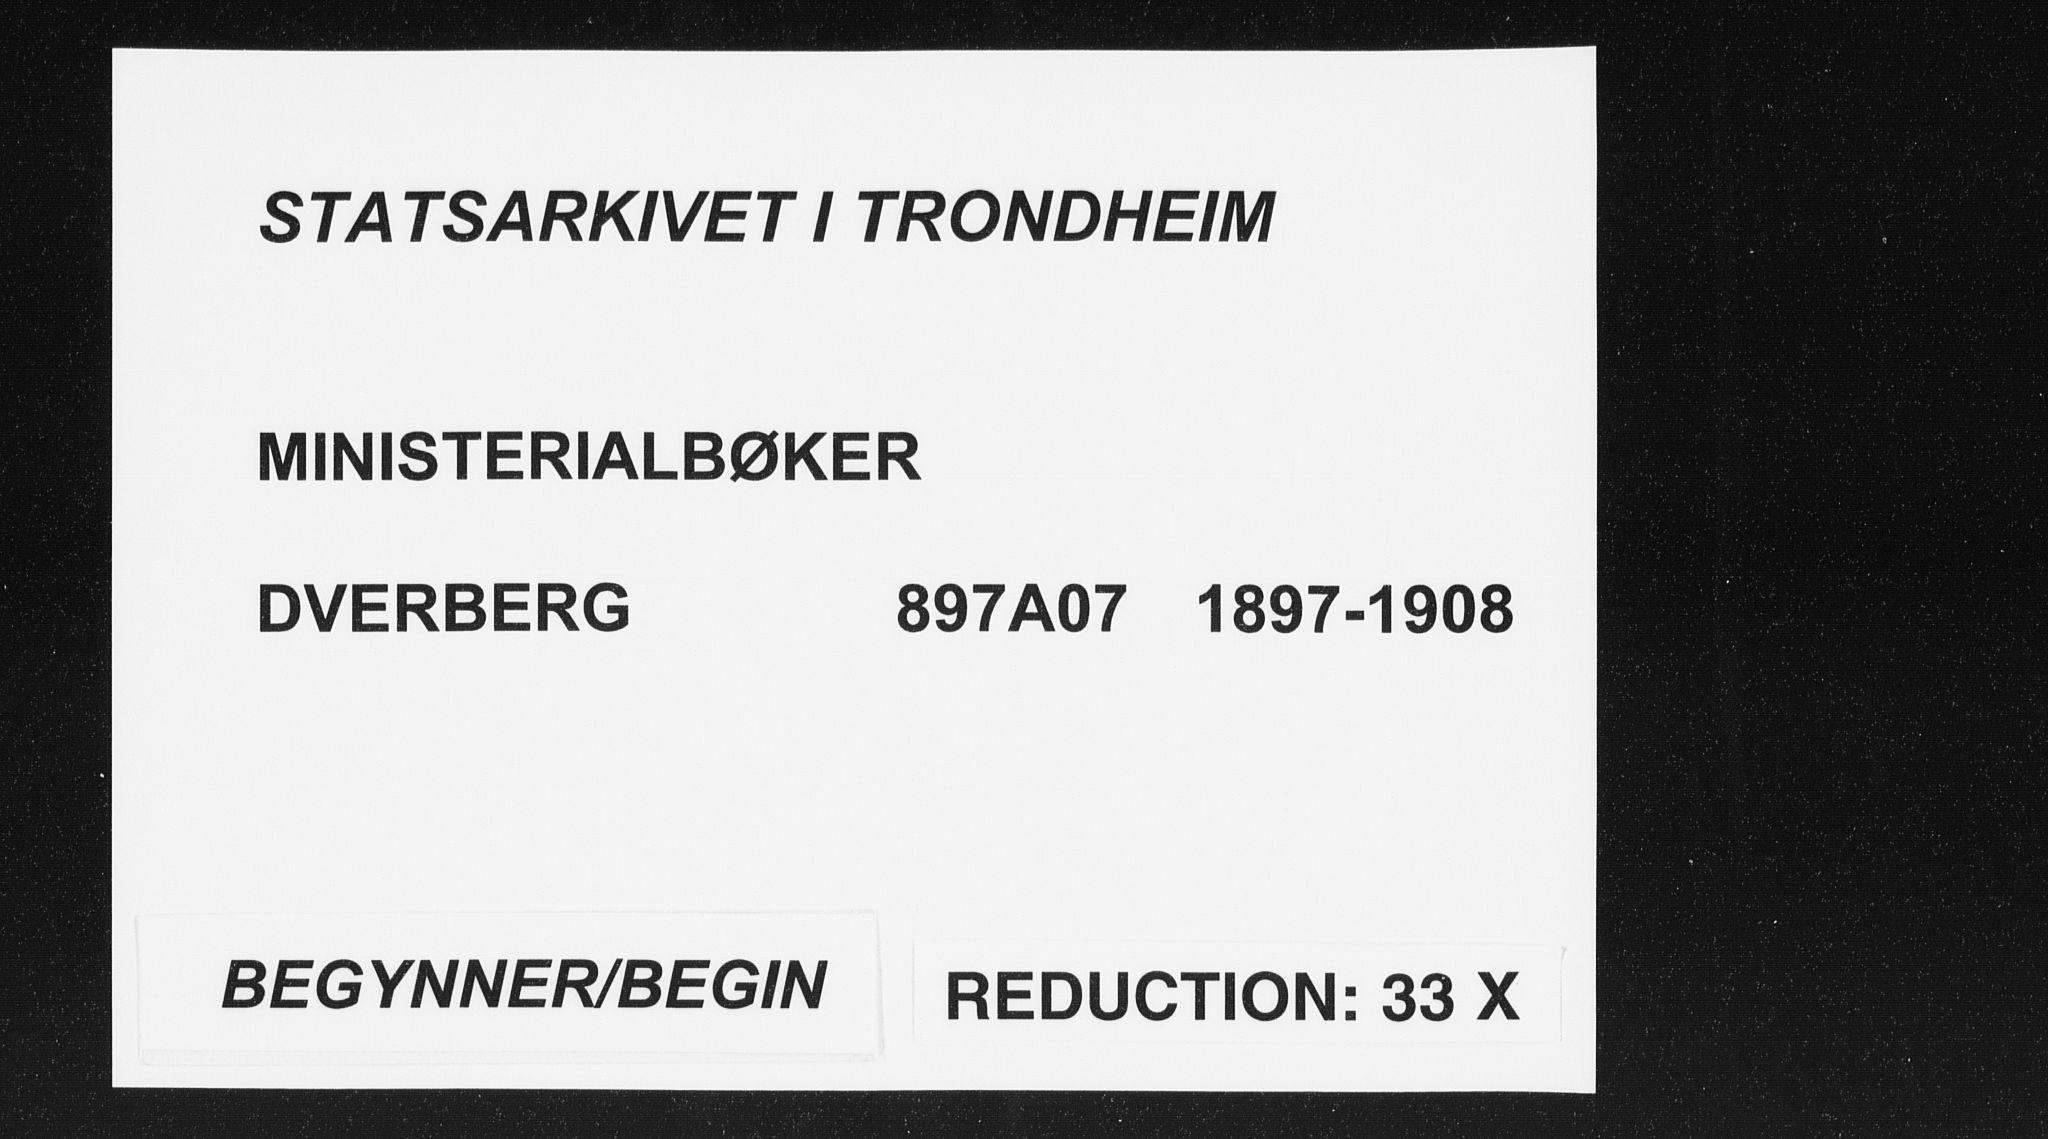 SAT, Ministerialprotokoller, klokkerbøker og fødselsregistre - Nordland, 897/L1400: Ministerialbok nr. 897A07, 1897-1908